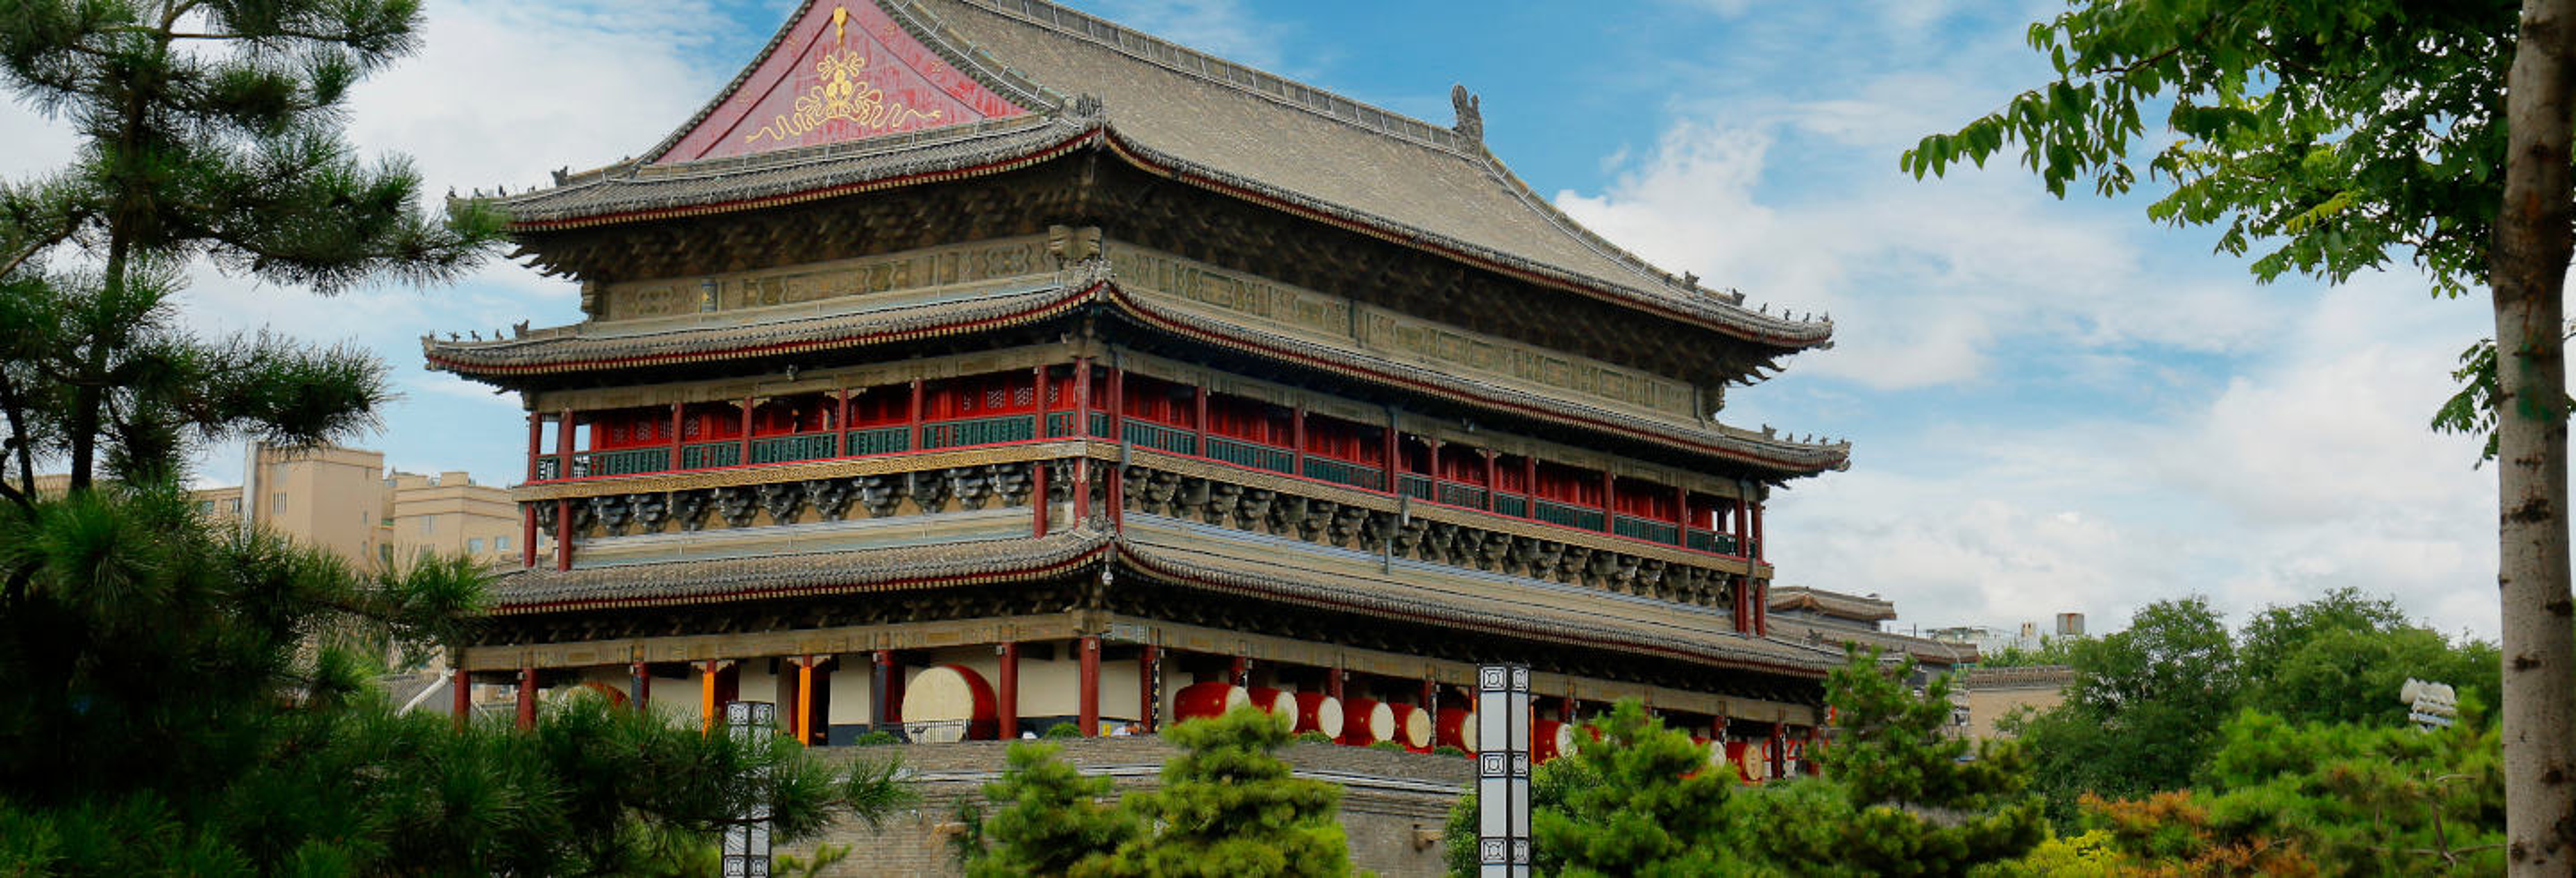 Tour por Xián al completo